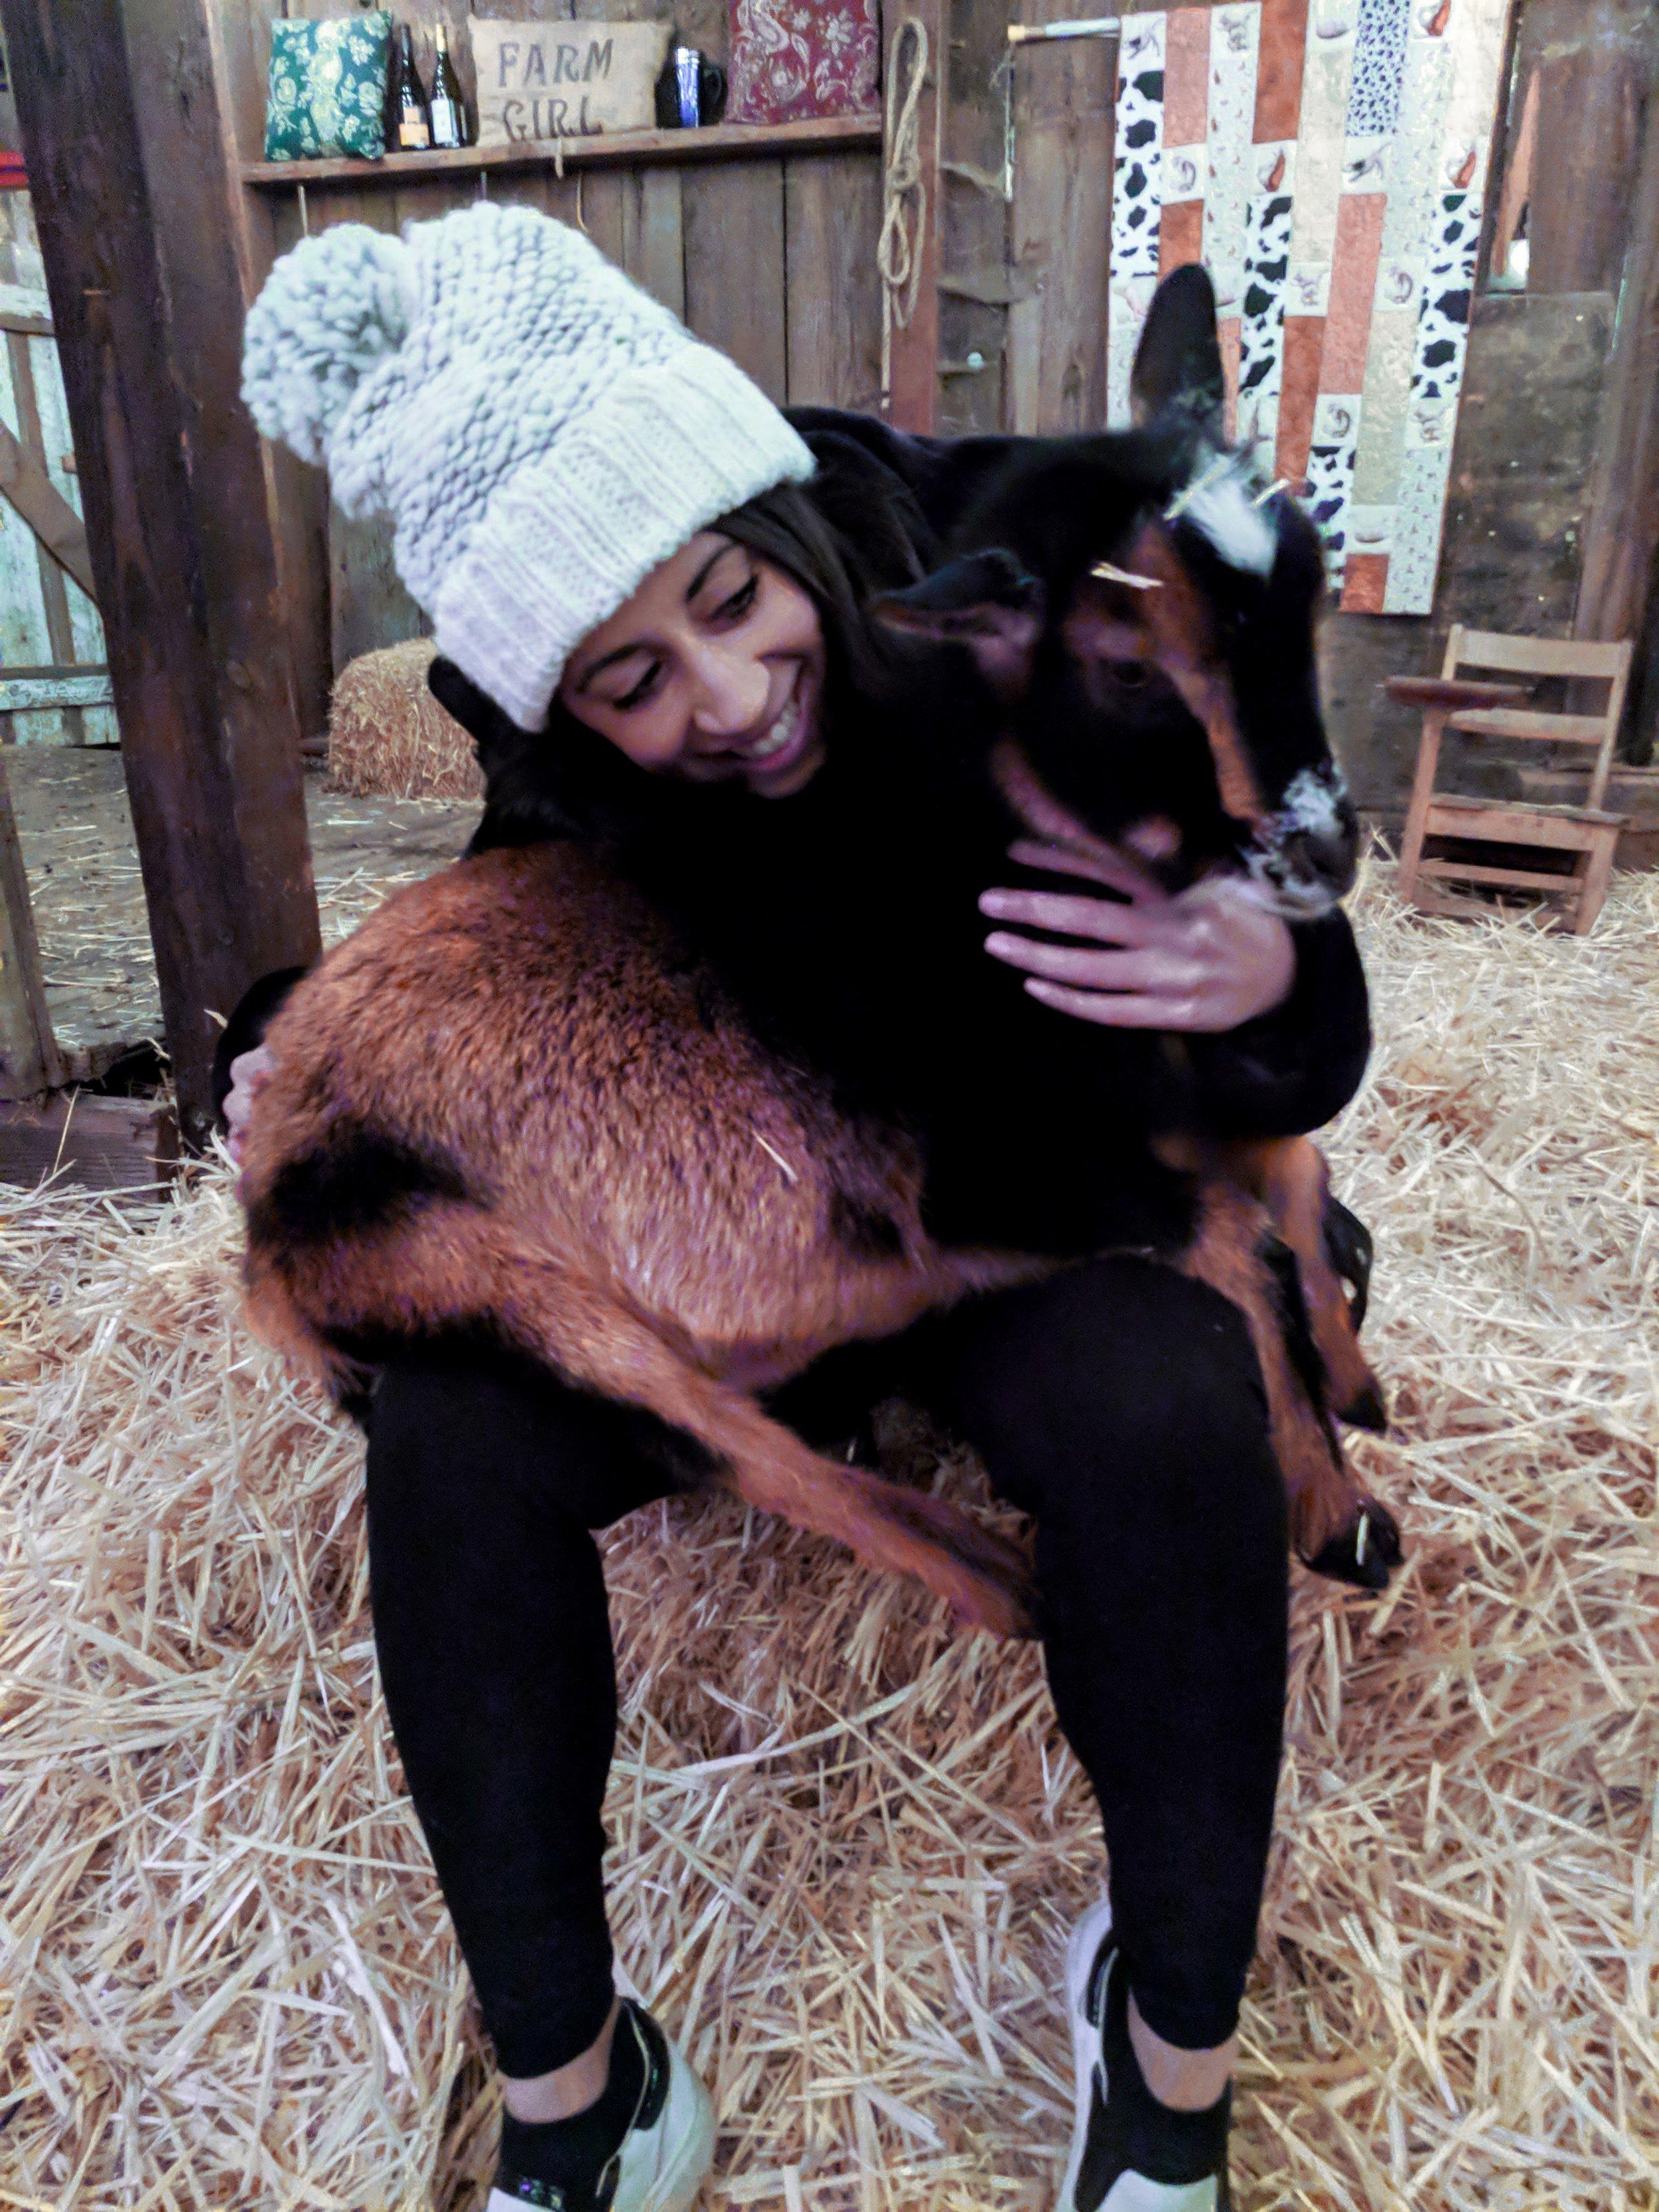 Goat-Yoga-goat-in-lap.jpg